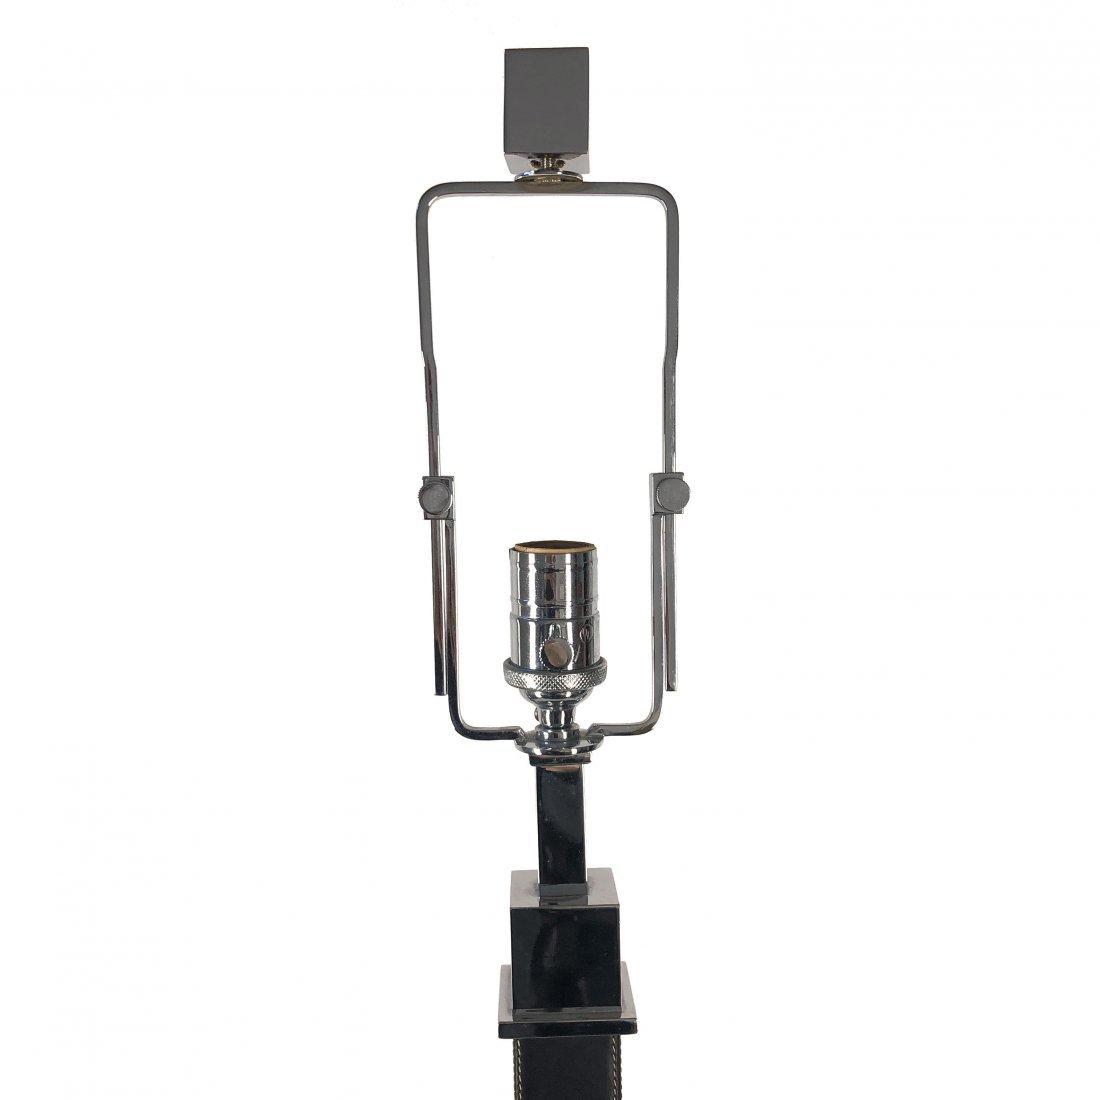 Ralph Lauren Polished Nickel Black Leather Table Lamp - 4